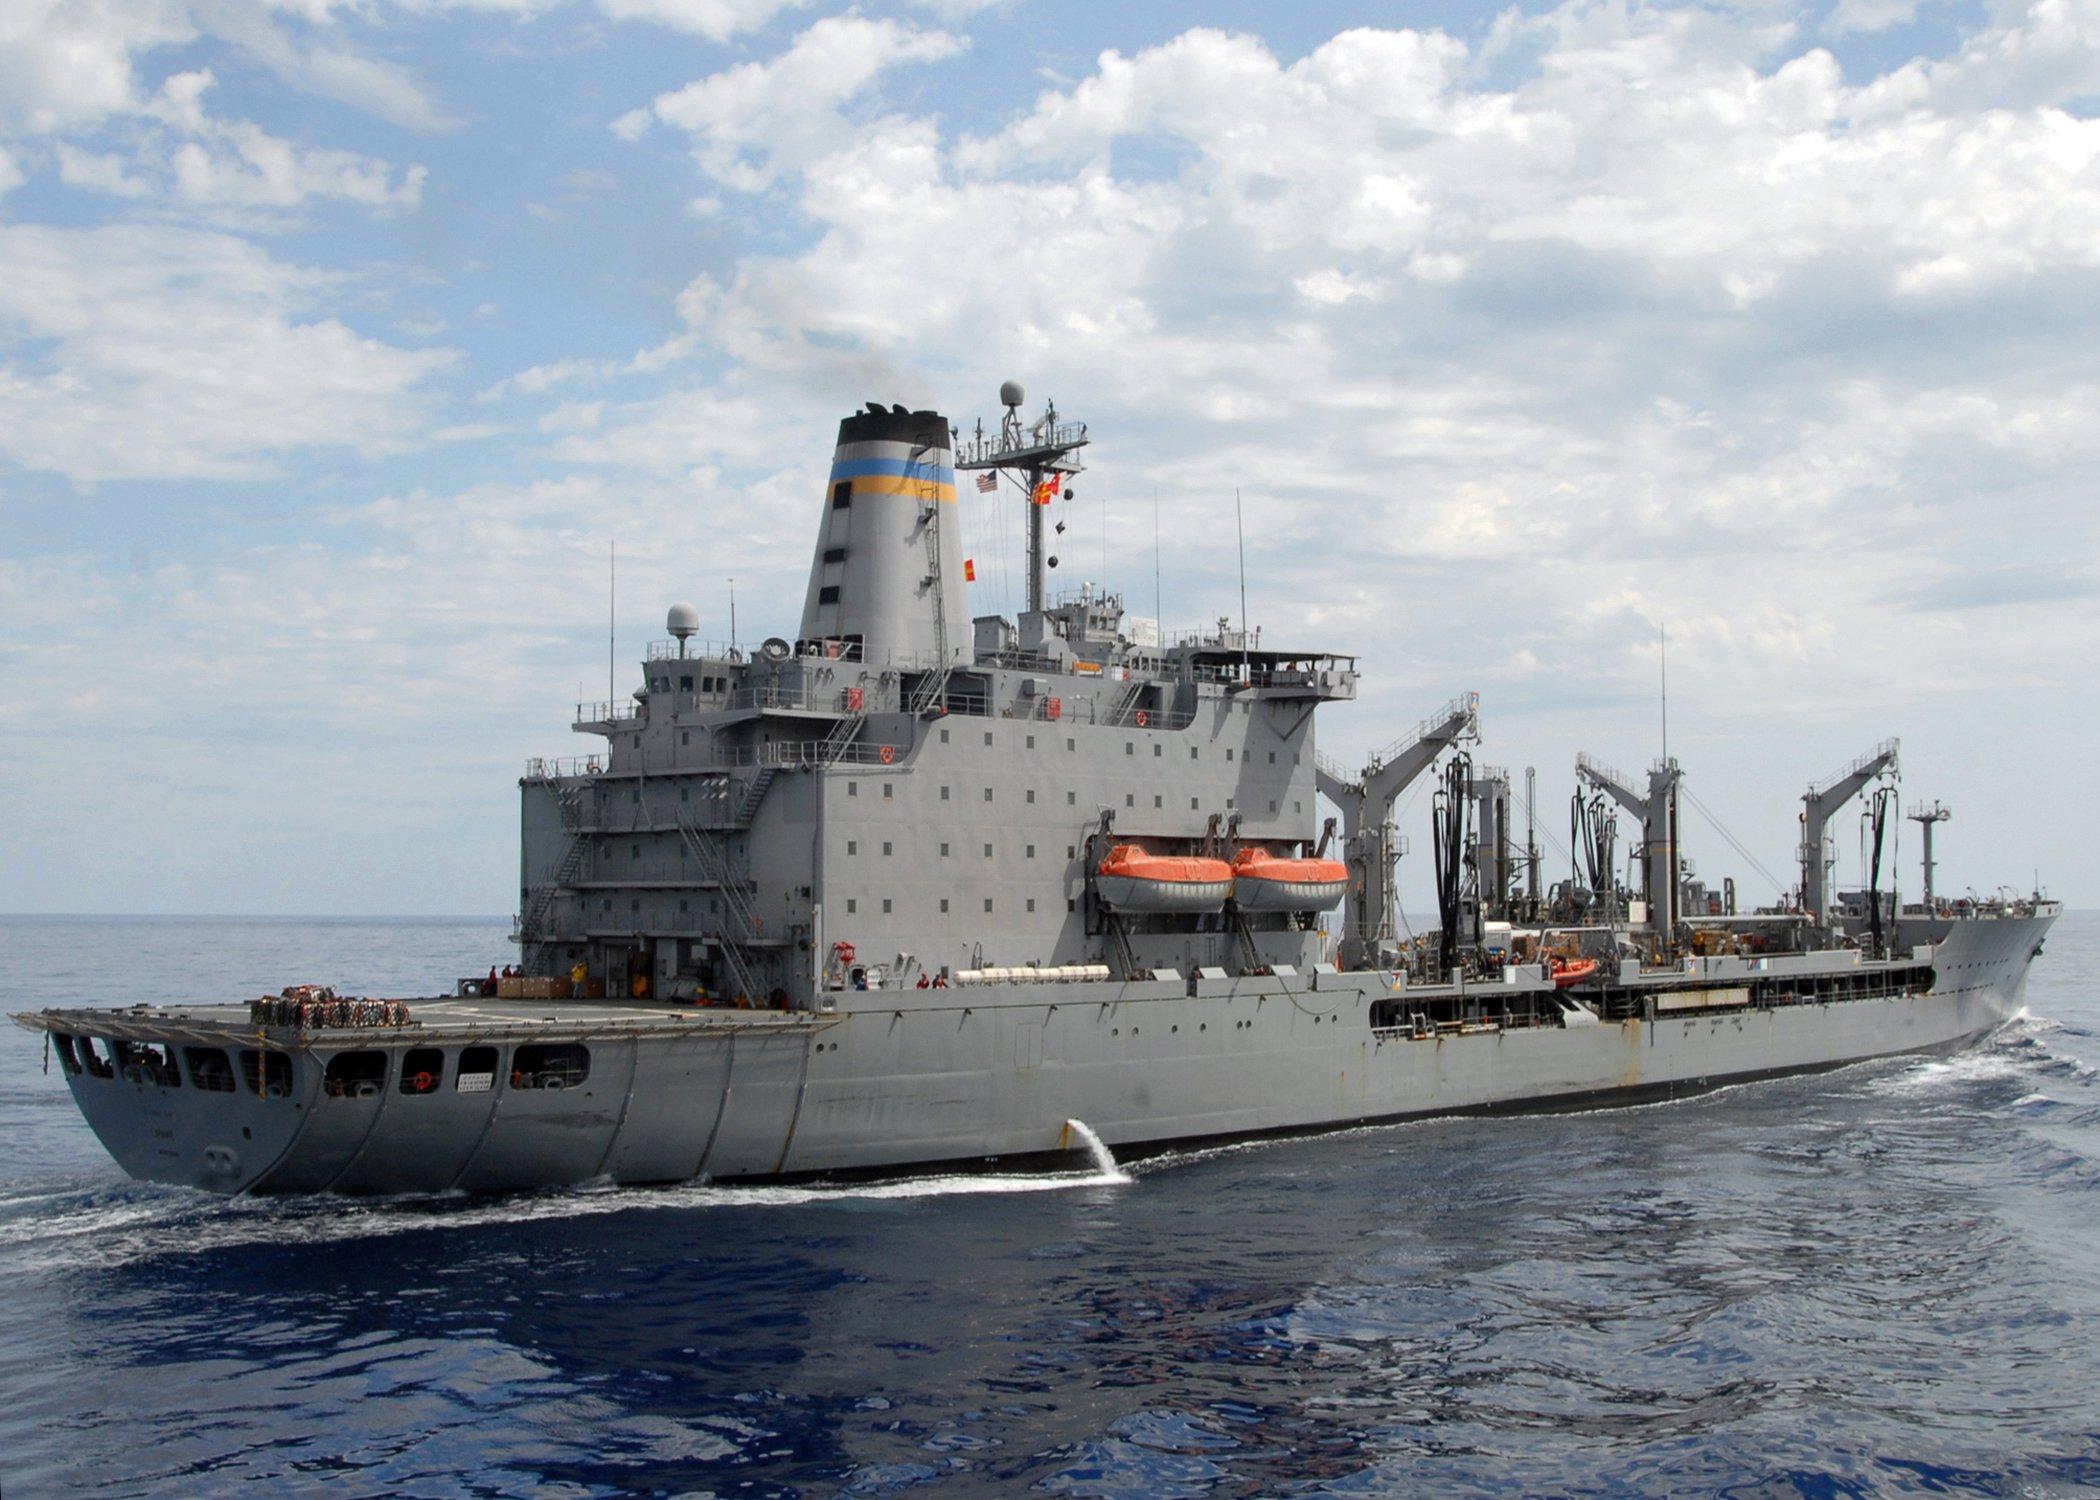 USNS Laramie's scheduled departure delayed due to engineering.